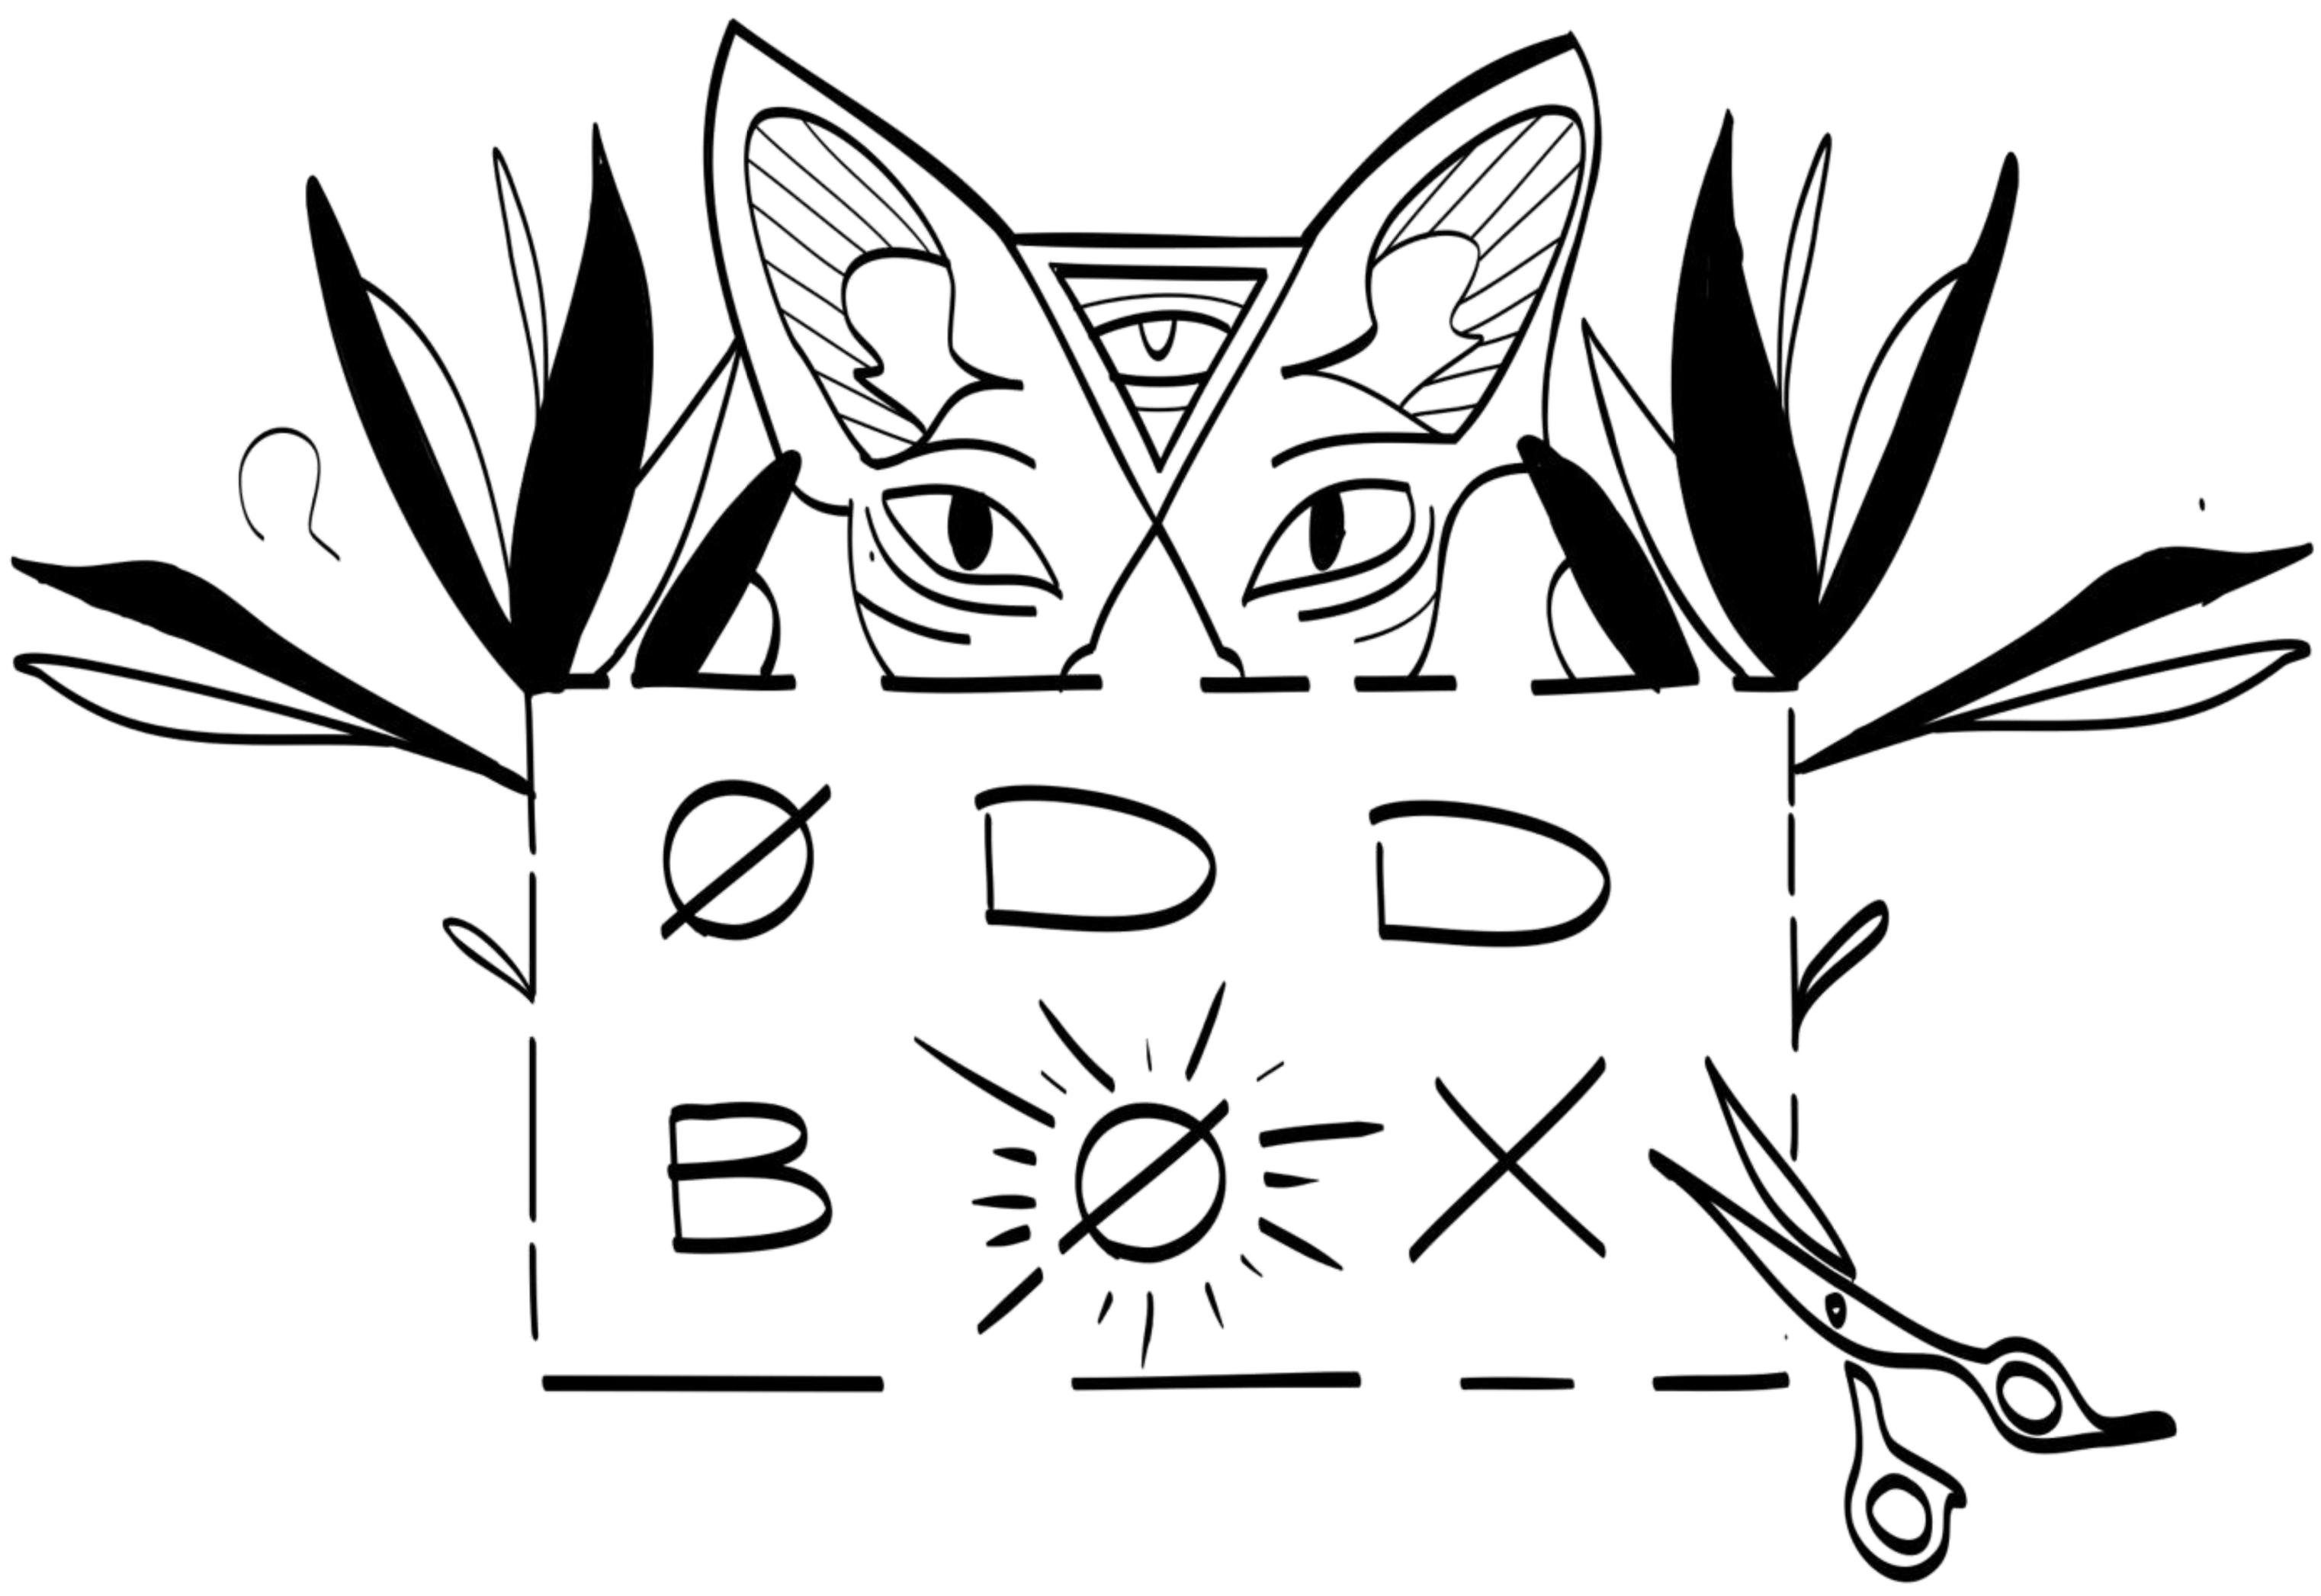 The Odd Box logo